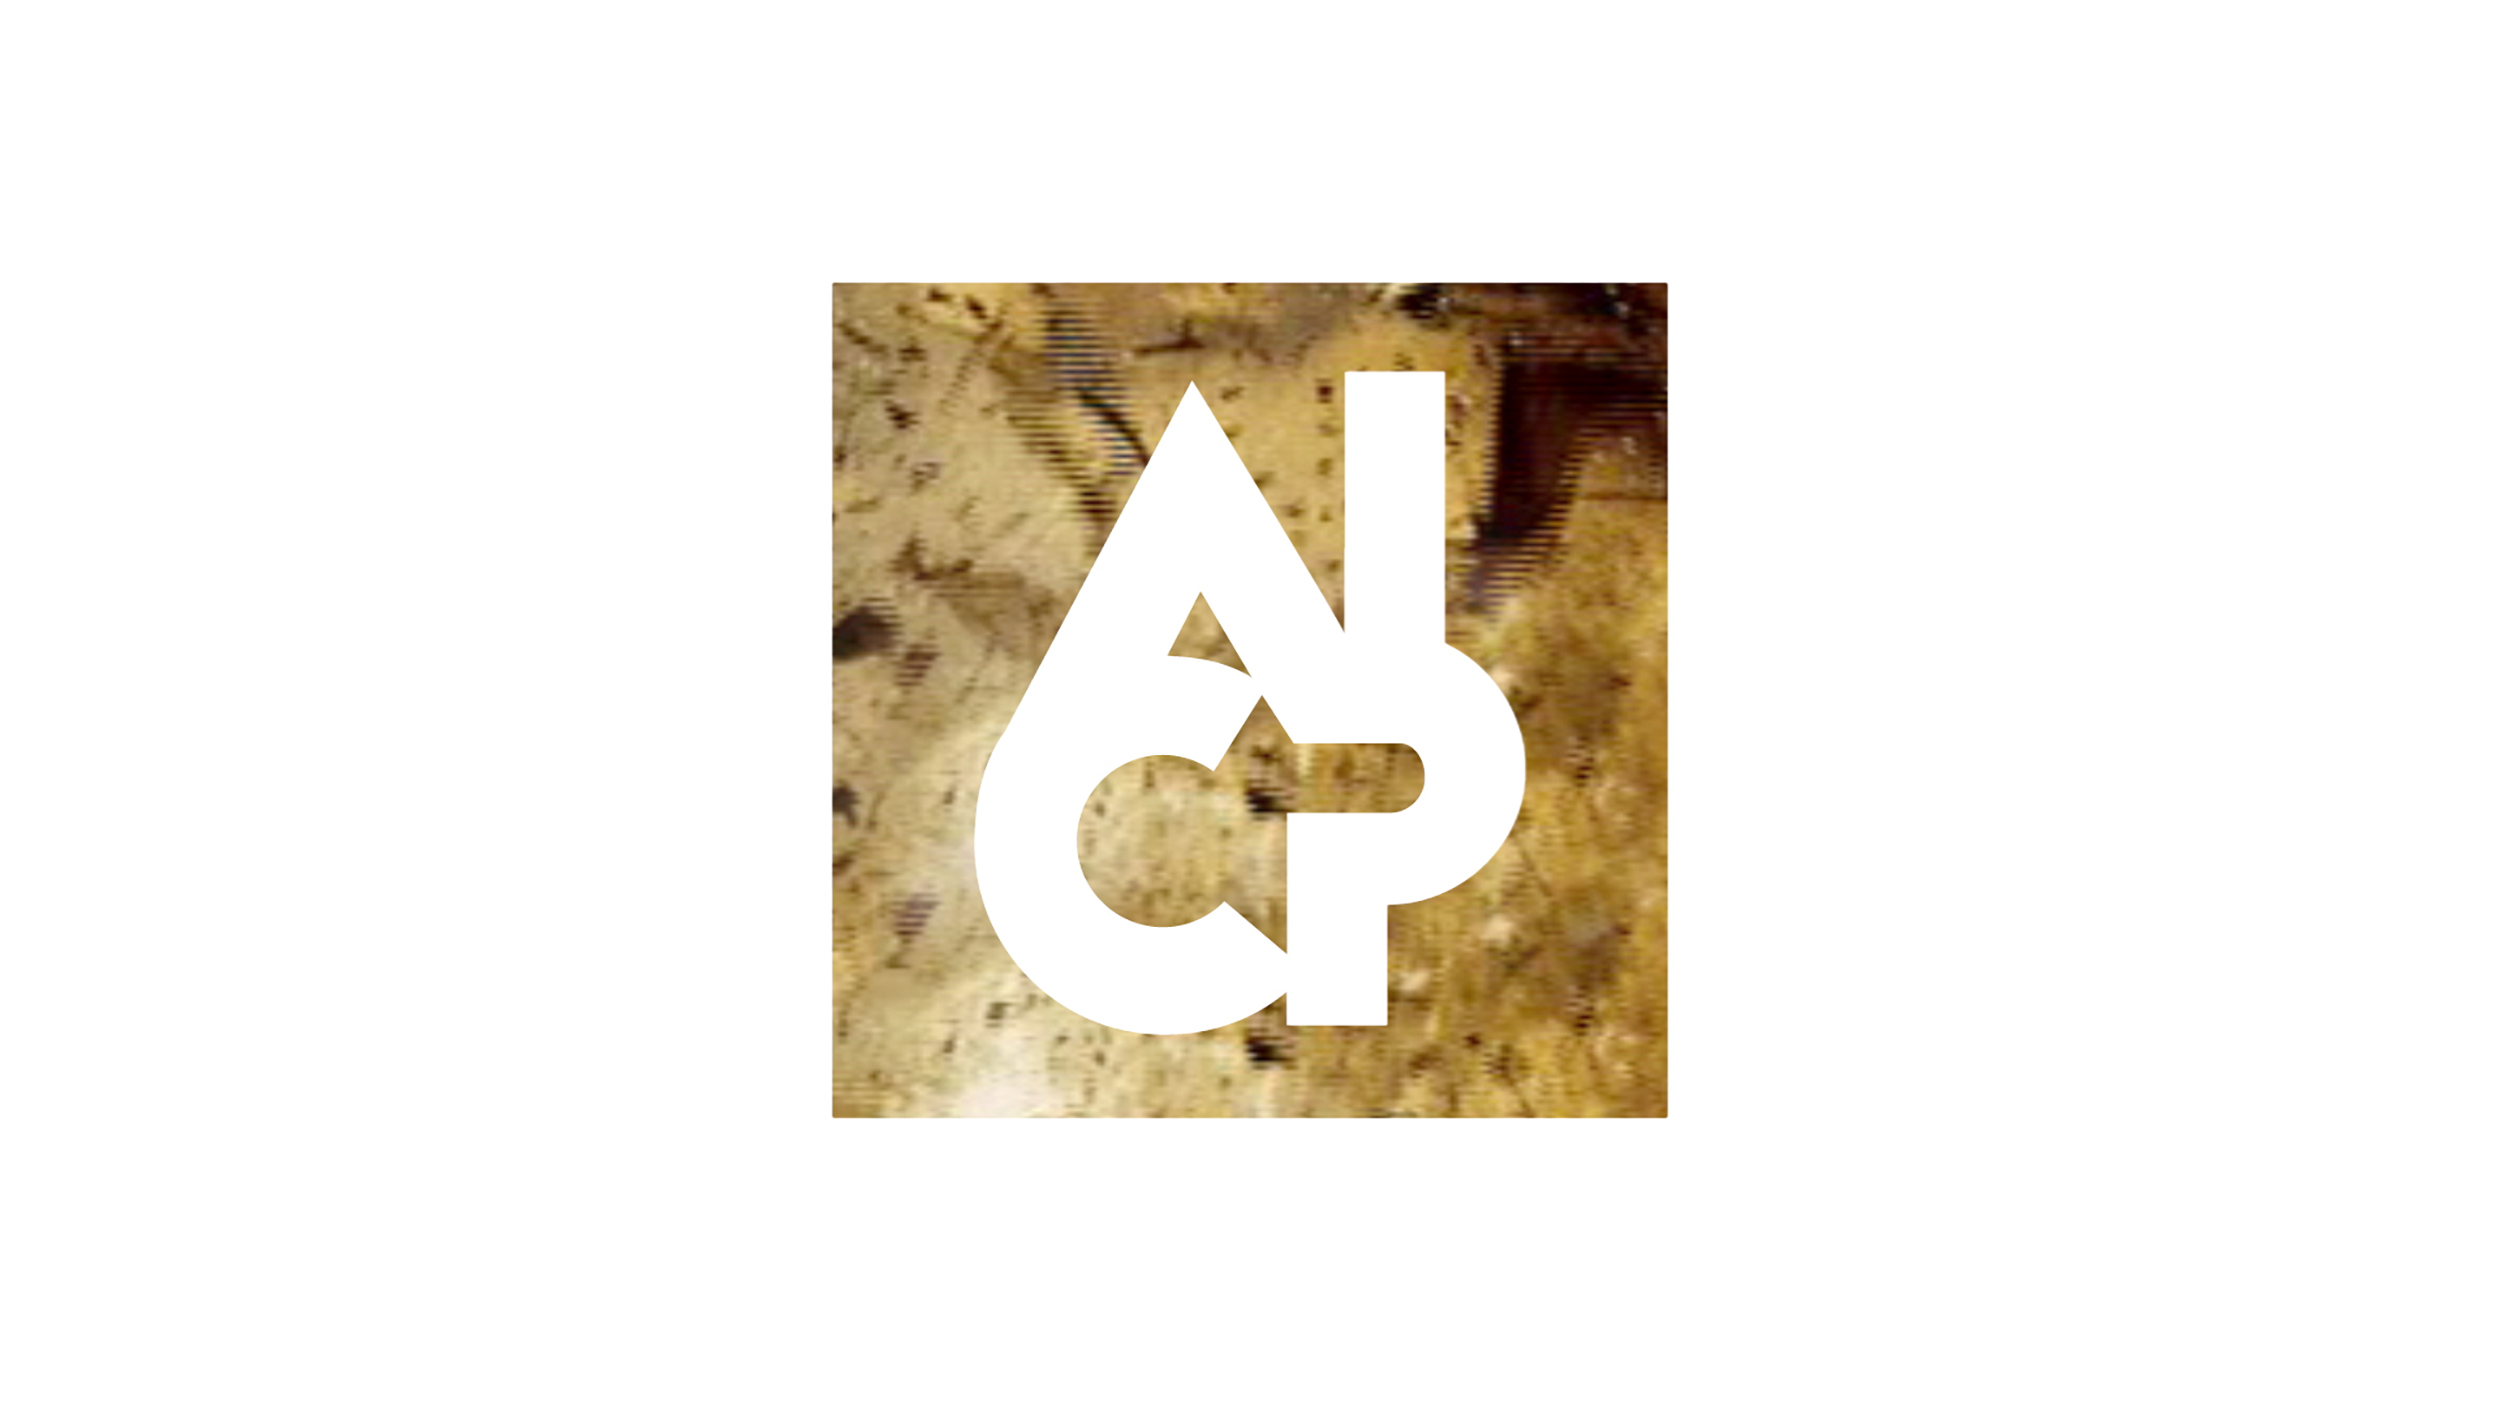 AICP_ShowOpen_01420.jpg